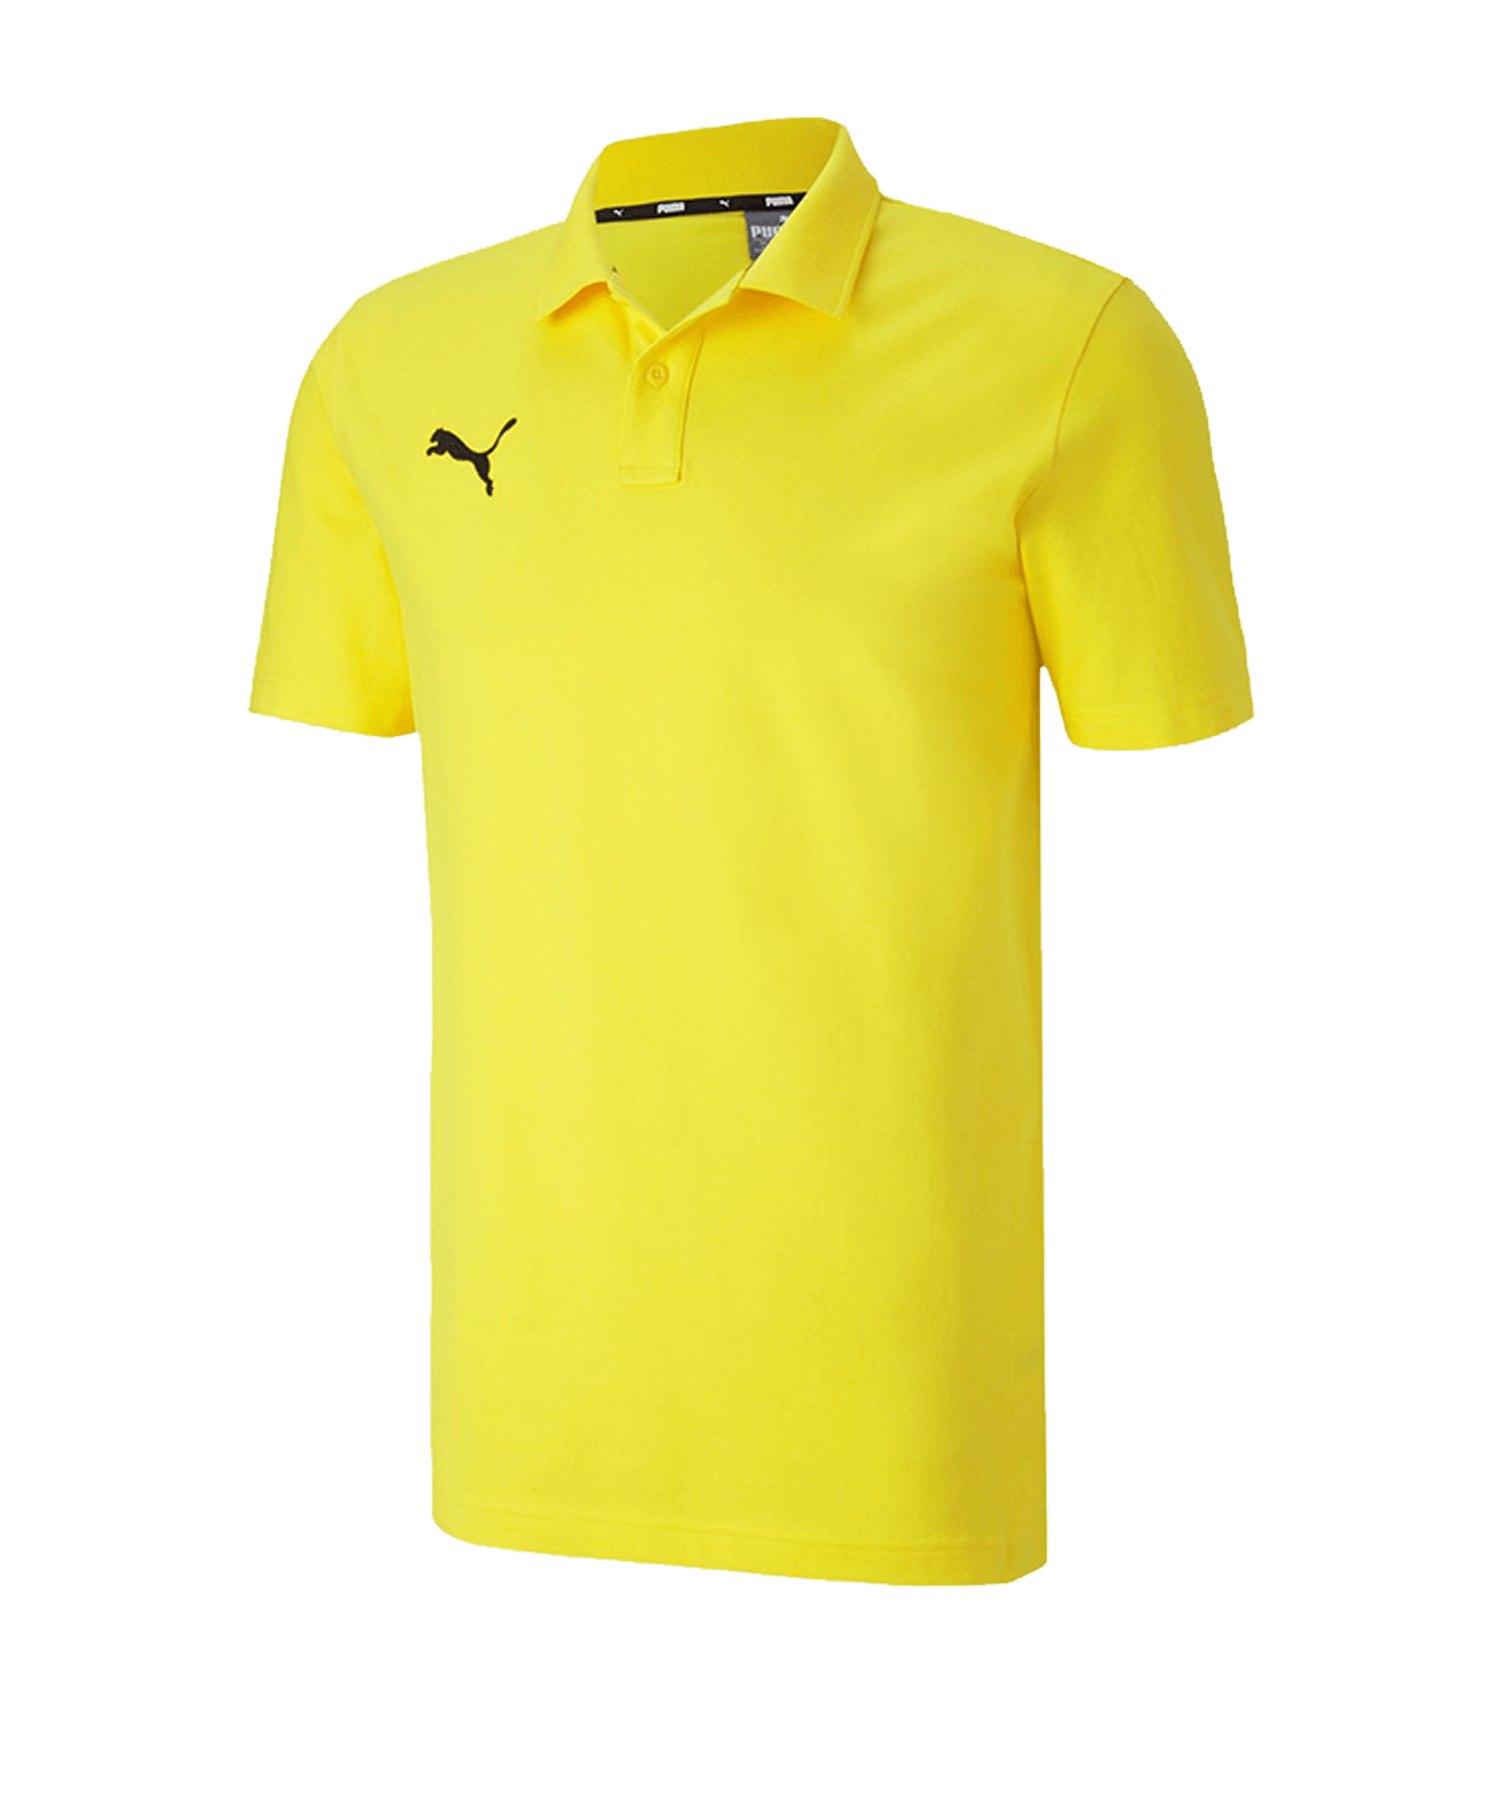 PUMA teamGOAL 23 Casuals Poloshirt Gelb F07 - gelb